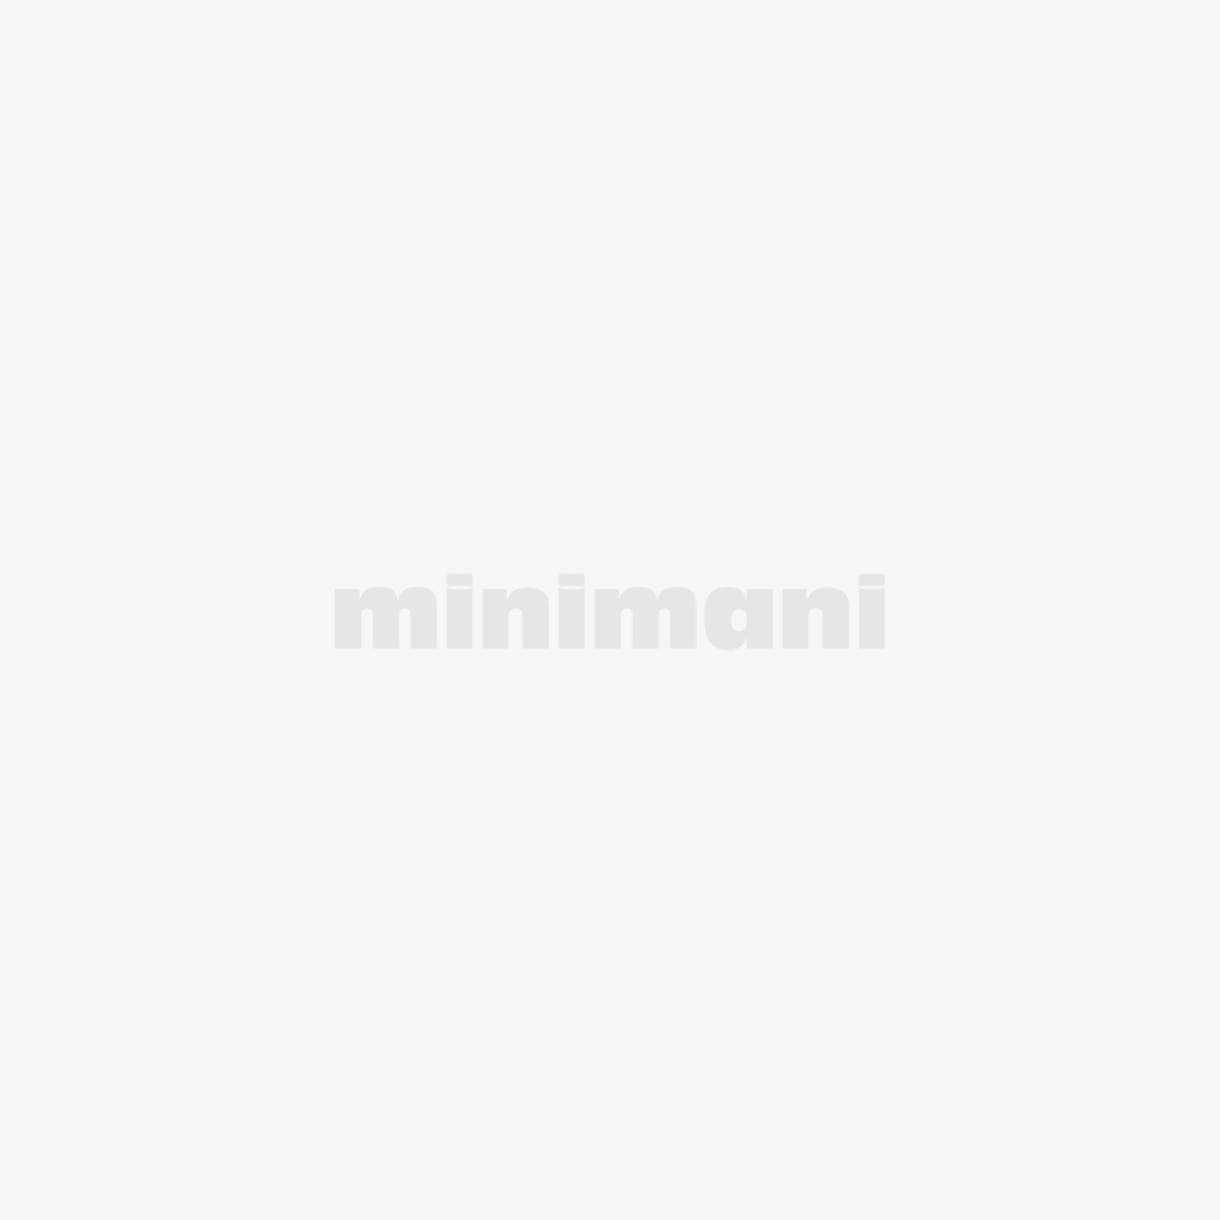 ARABIA MOOMIN MEHULUSIKKA MUUMIPAPPA 2017